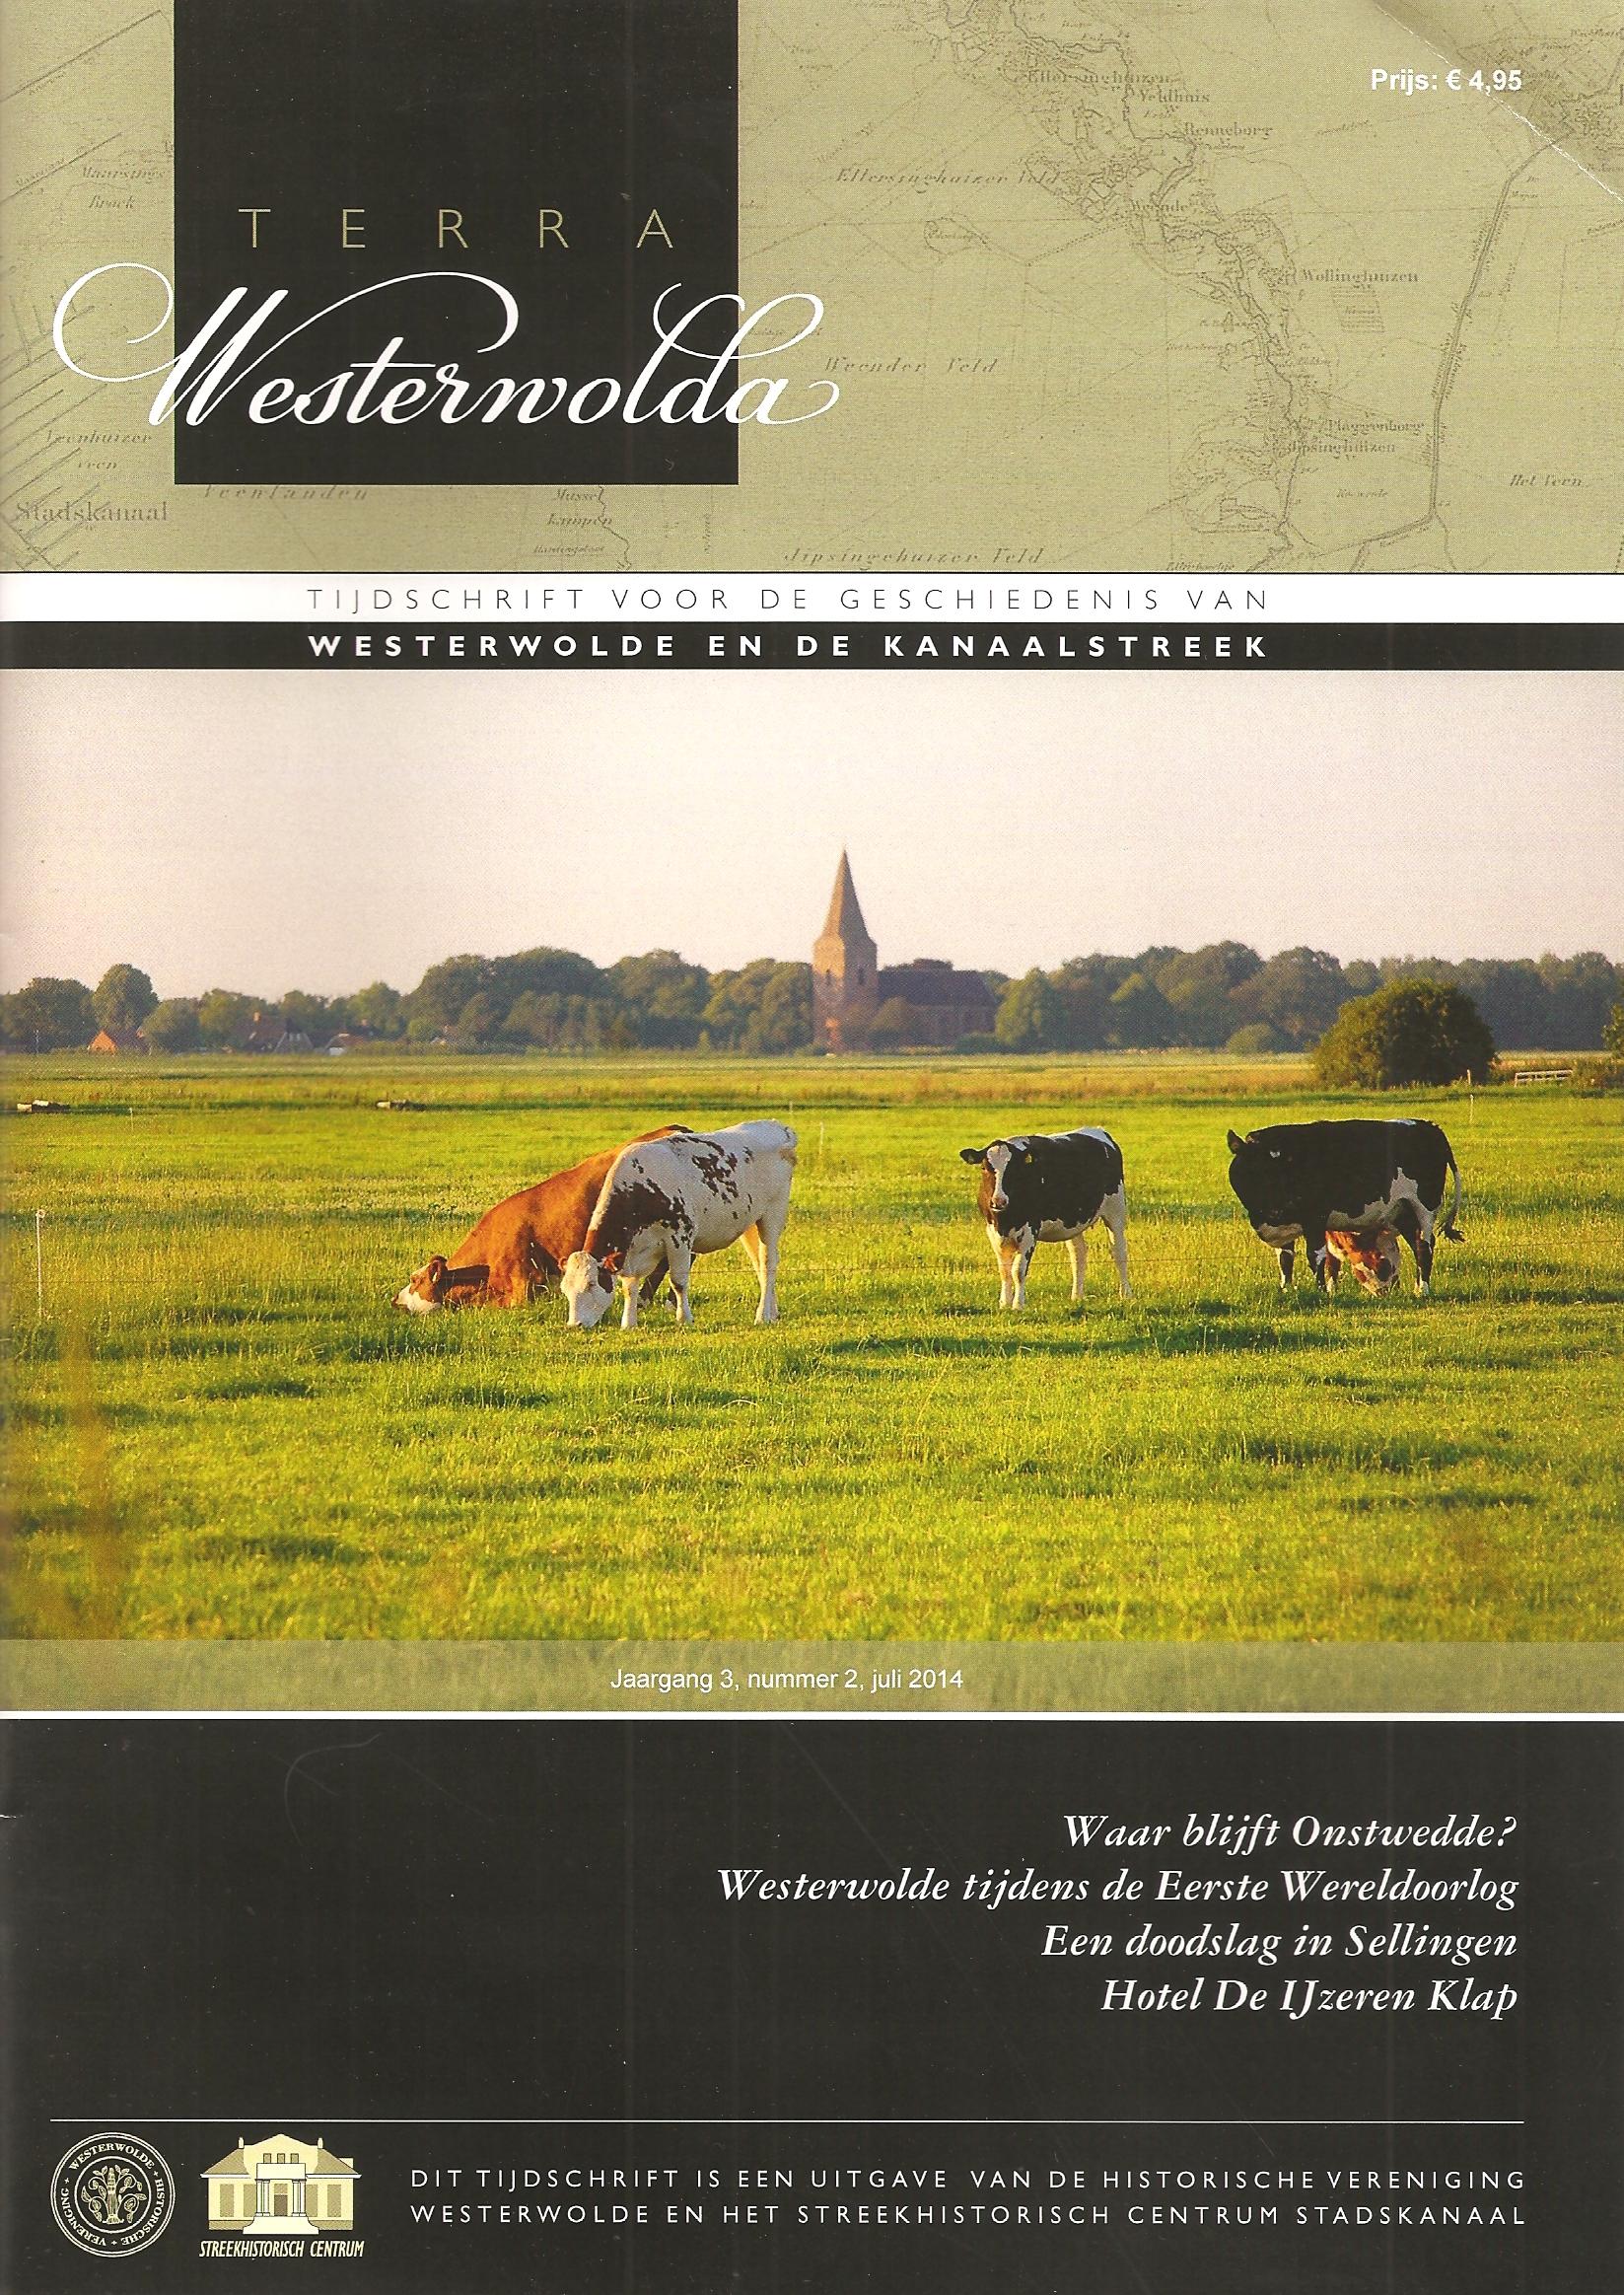 Terra Westerwolda 3-2